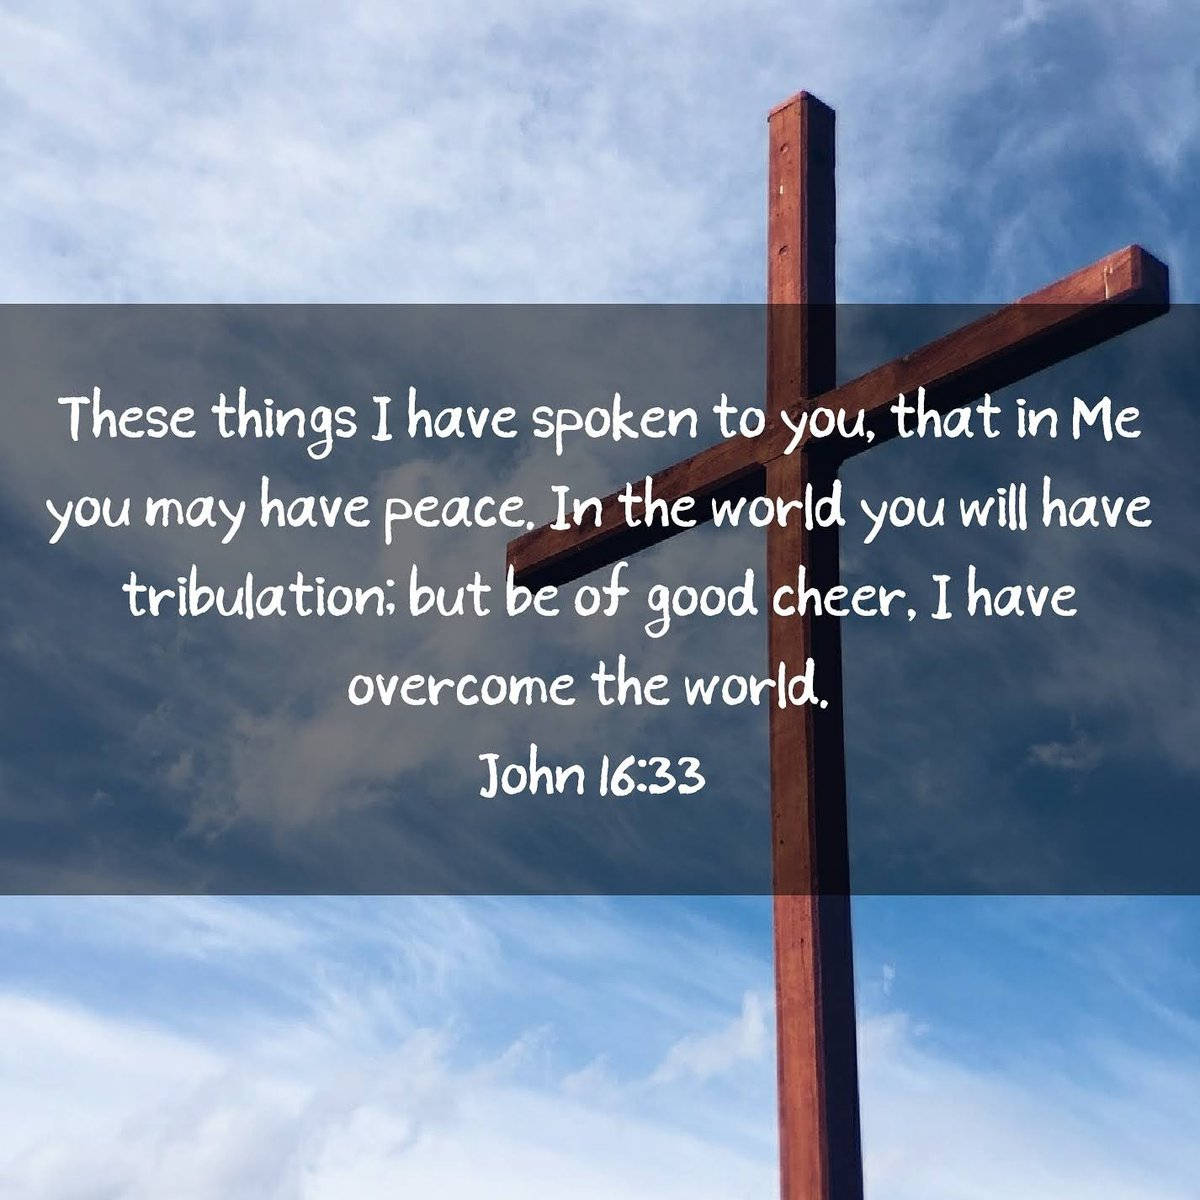 #ThursdayThoughts #ThursdayMotivation #ThankfulThursday #Bible #Jesus